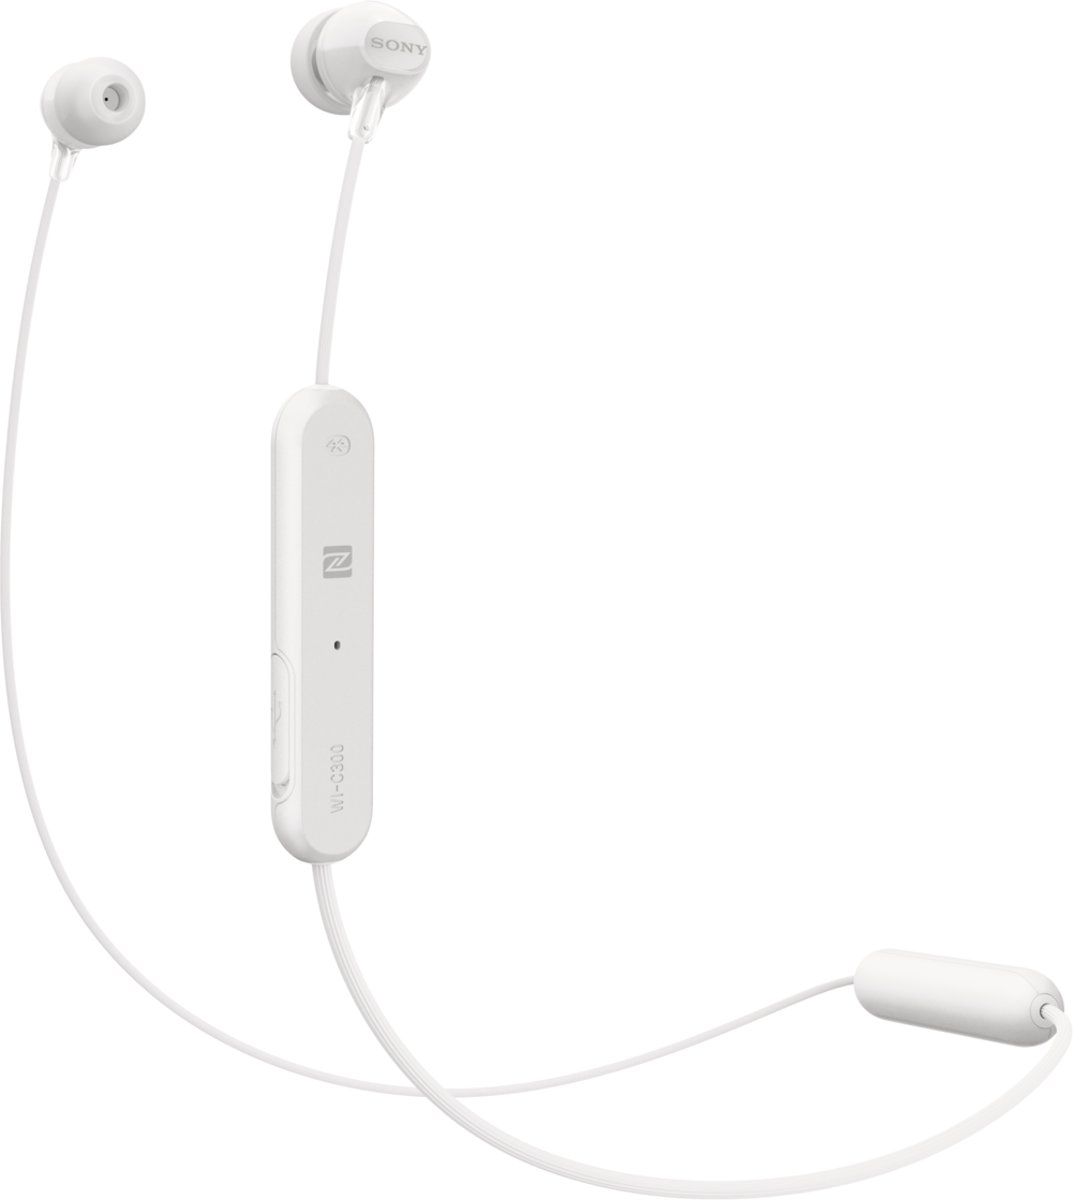 WI-C300 draadloze oortelefoon